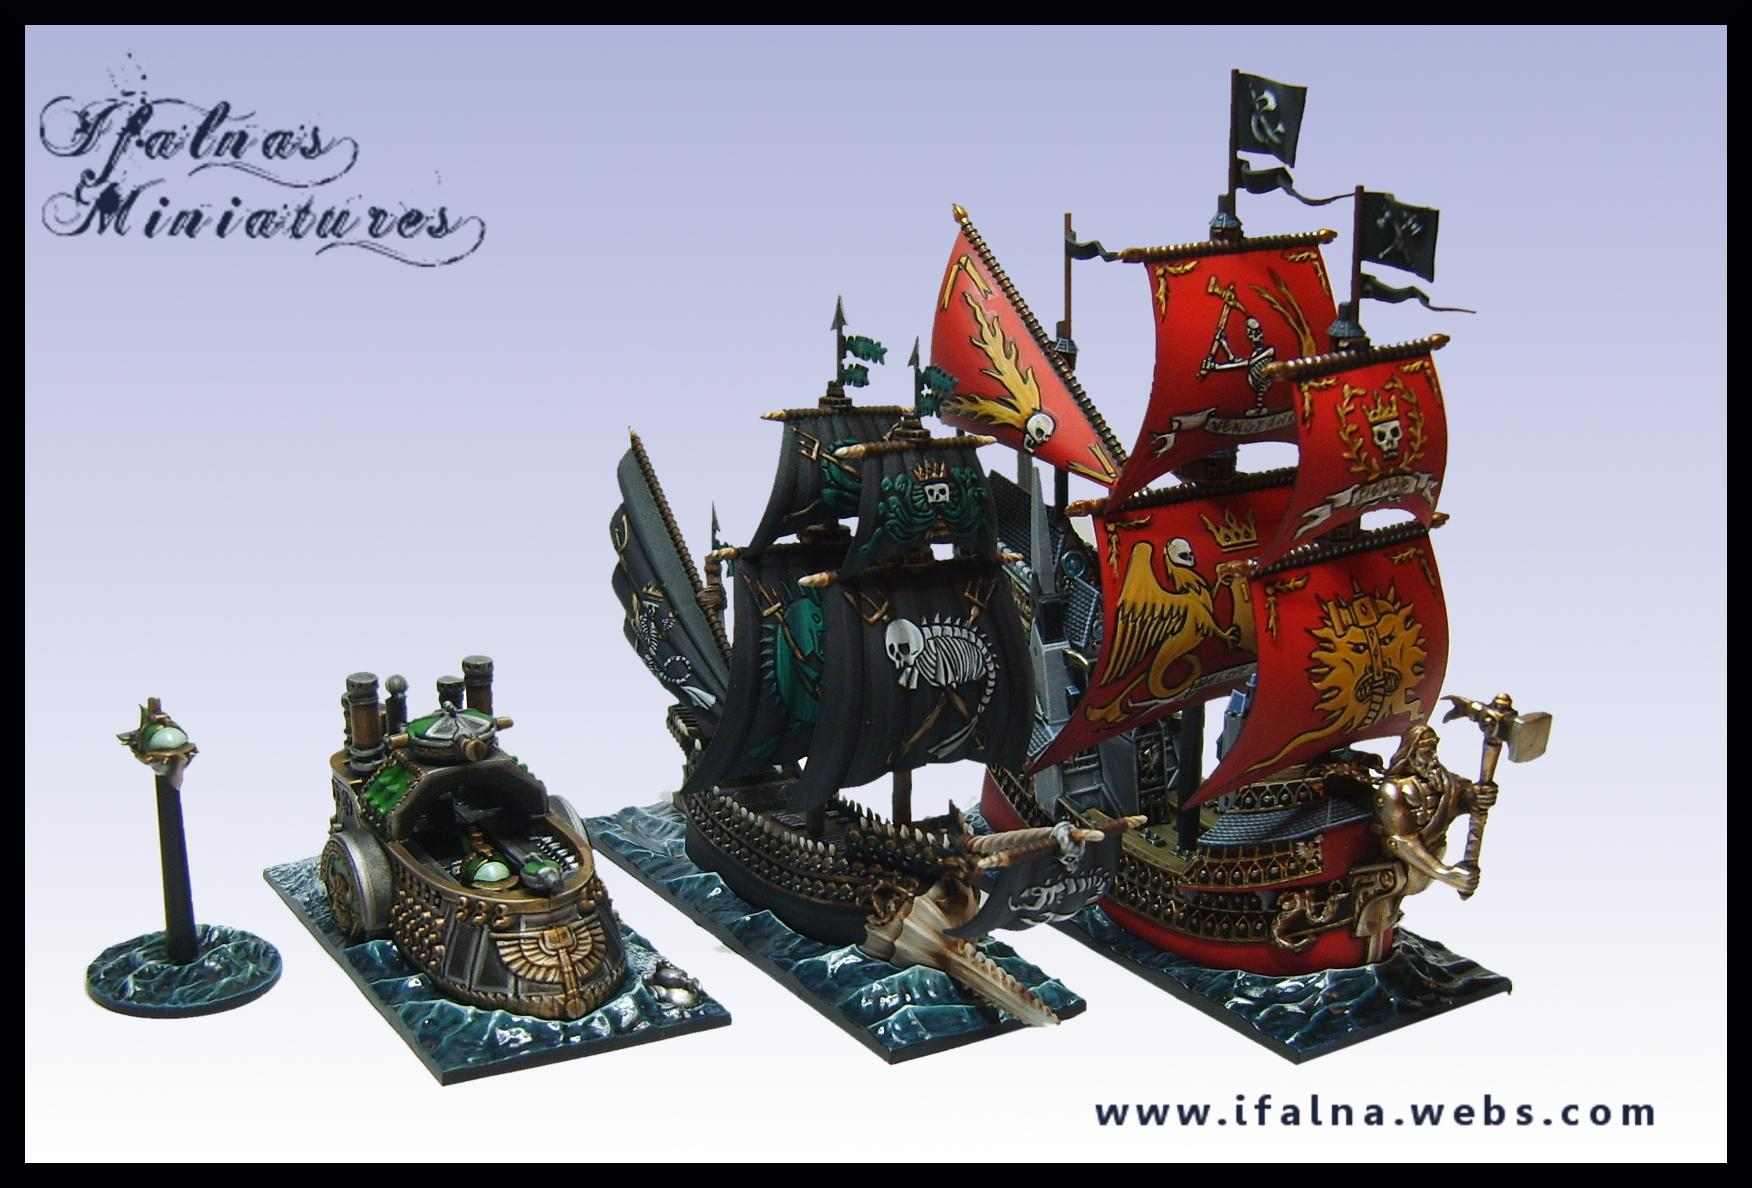 Black, Blimp, Boat, Dreadfleet, Flag, Games Workshop, Gold, Heldenhammer, Metal, Red, Sail, Sea, Ship, Swordfish, Thunder, Water